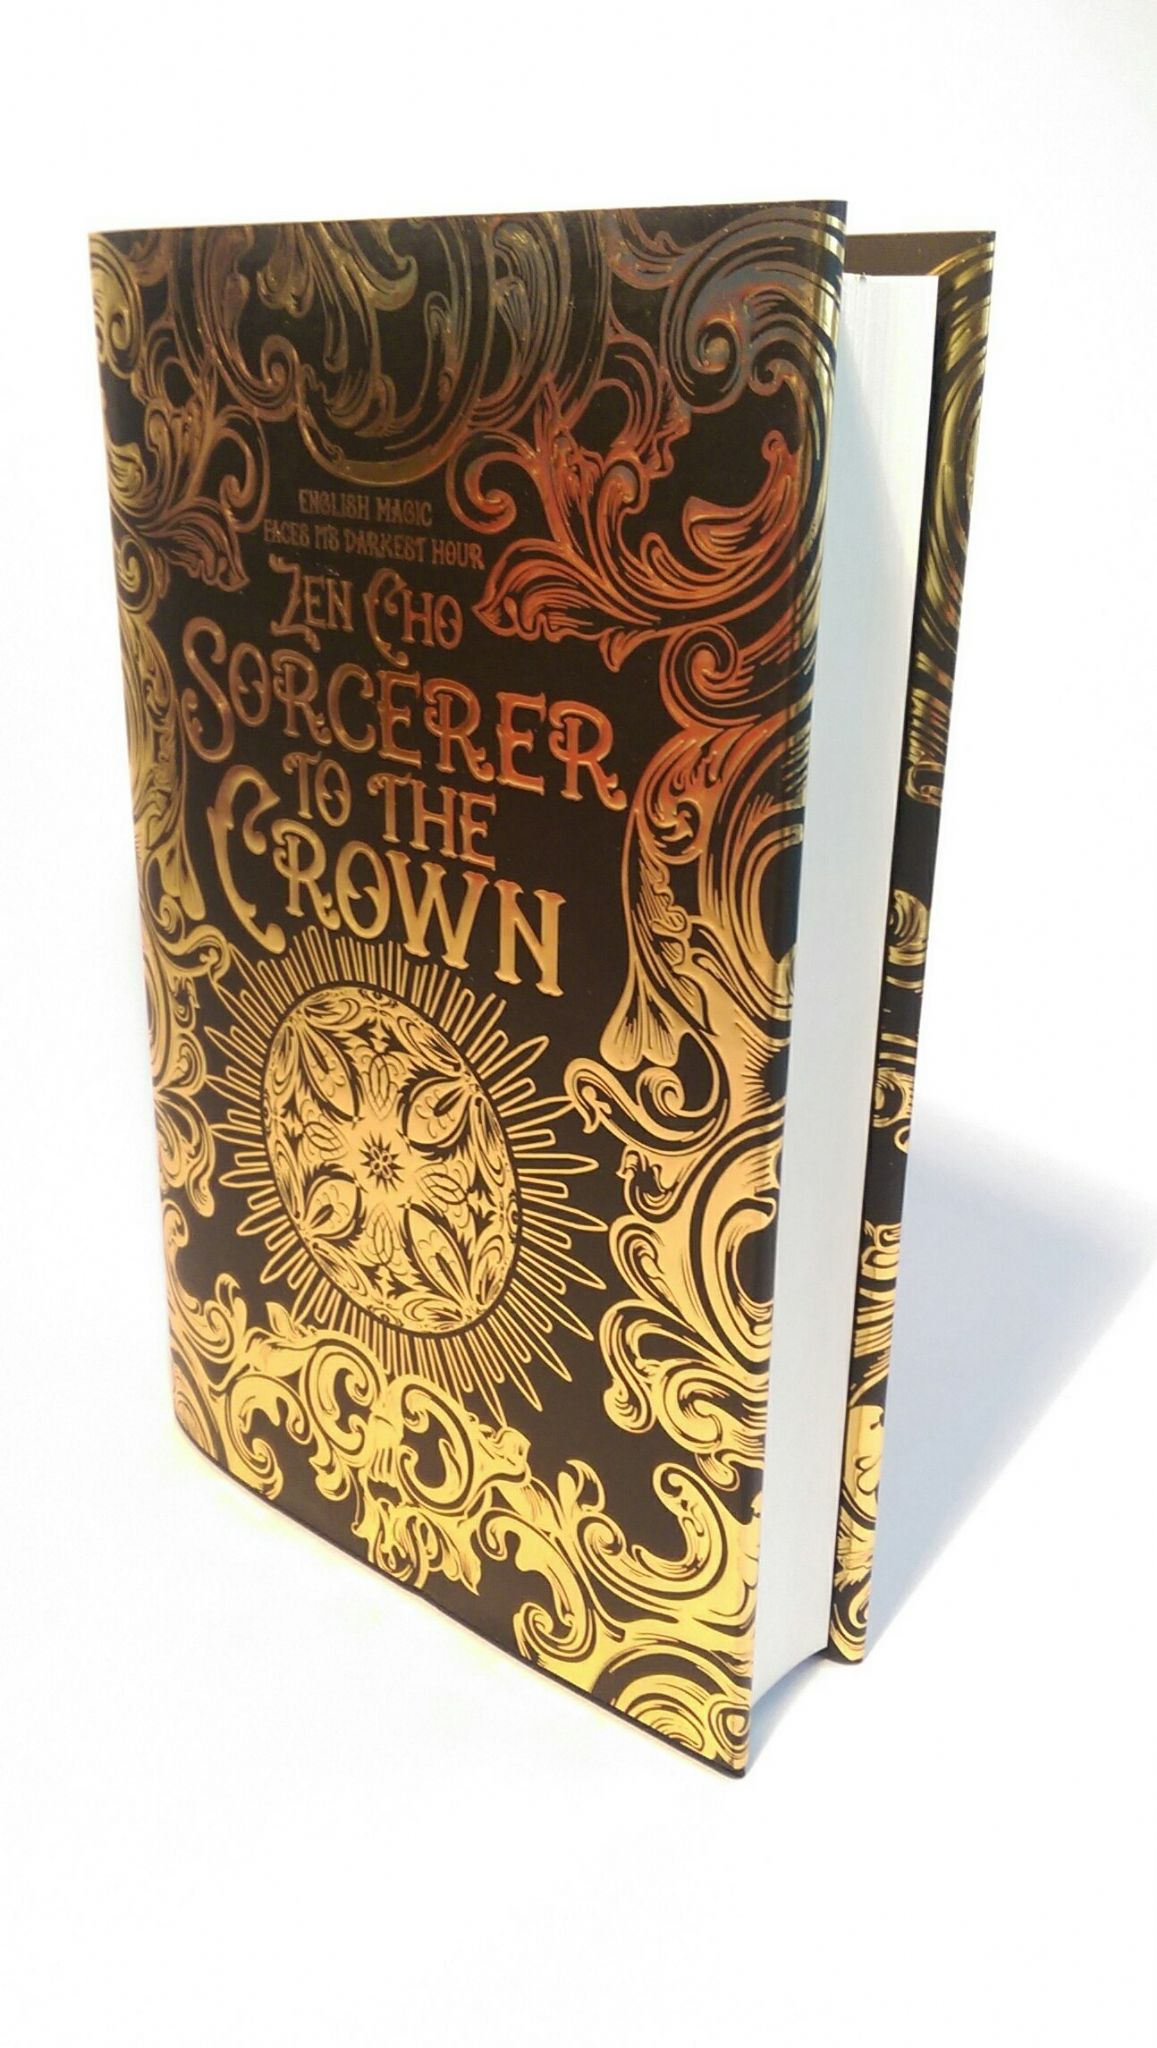 sorcerertothecrown_version-uk_3dc12